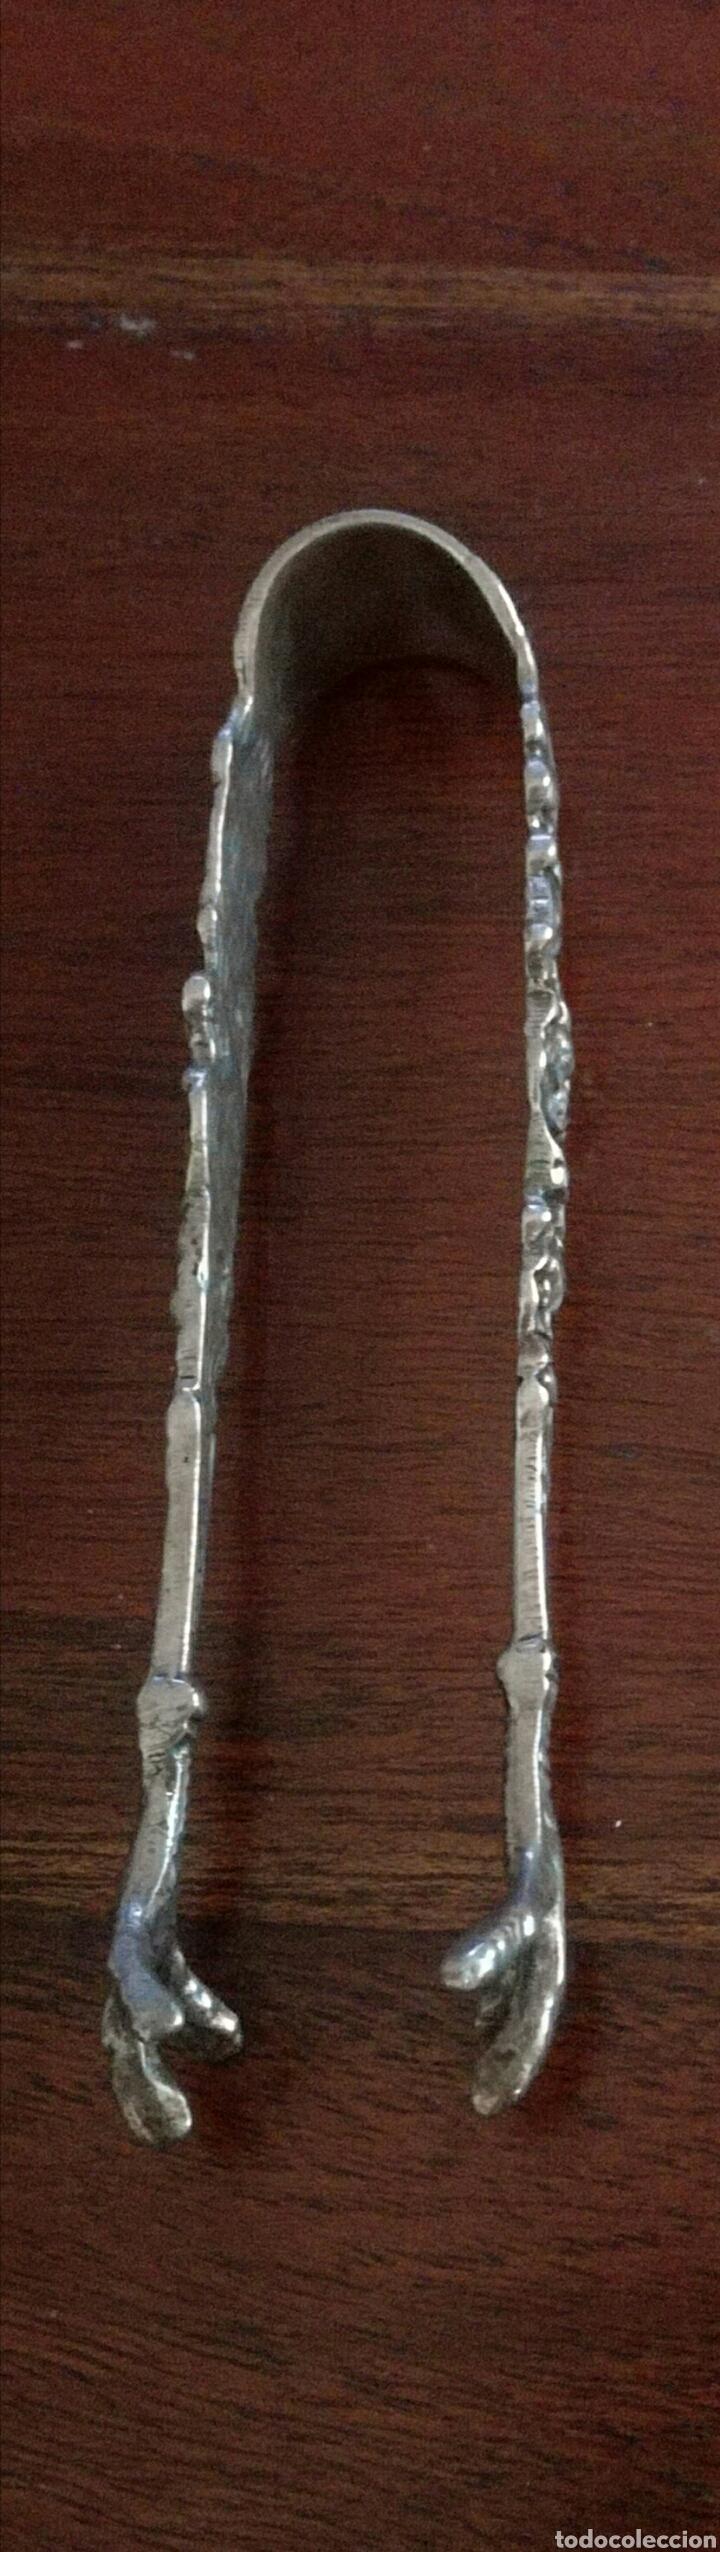 Antigüedades: Pinzas de plata para azucarero - Foto 3 - 76721186